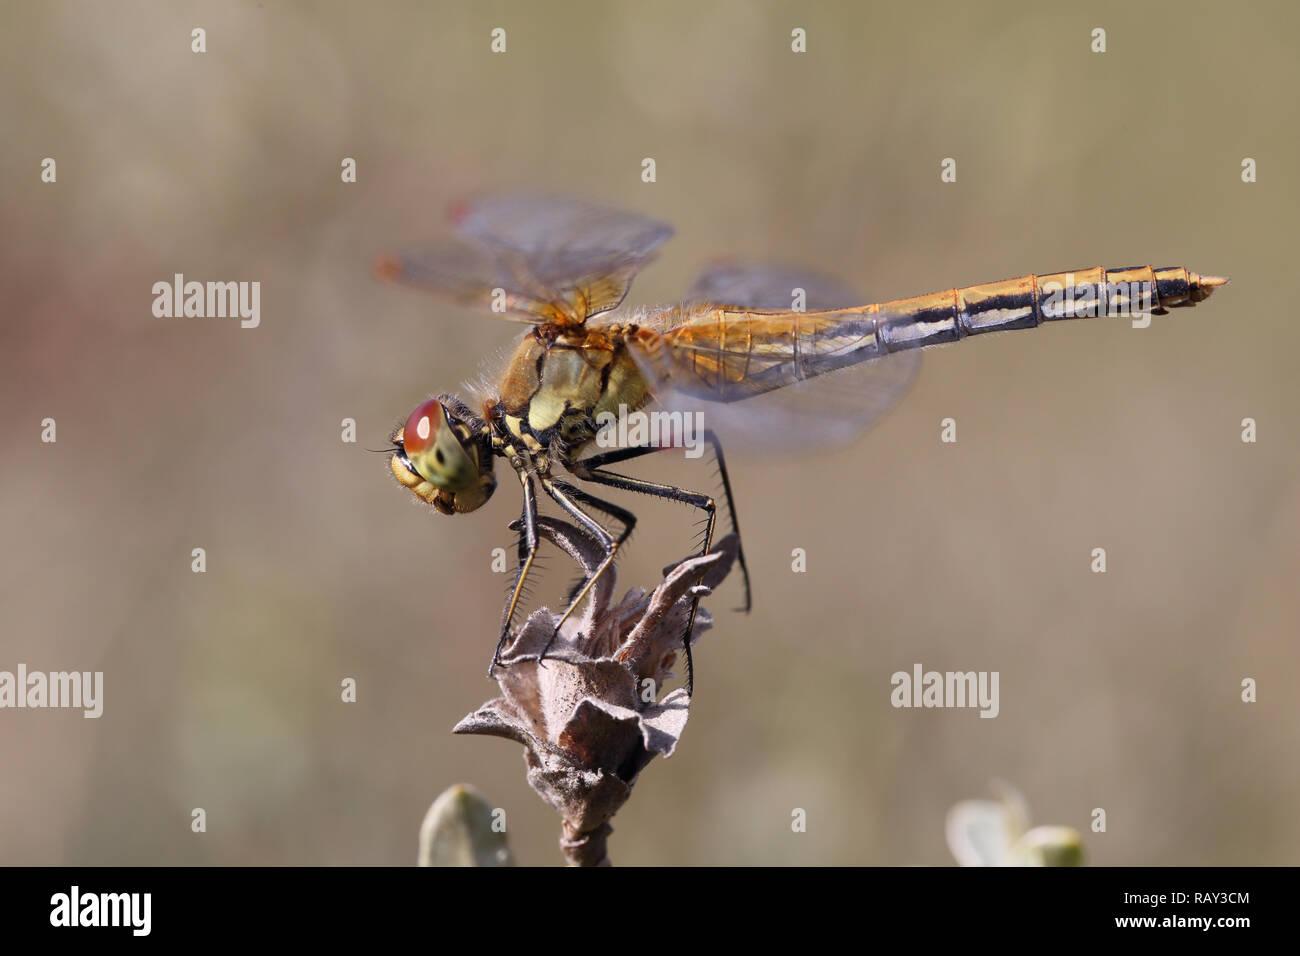 Yellow-winged Darter (Sympetrum flaveolum) Photo Stock